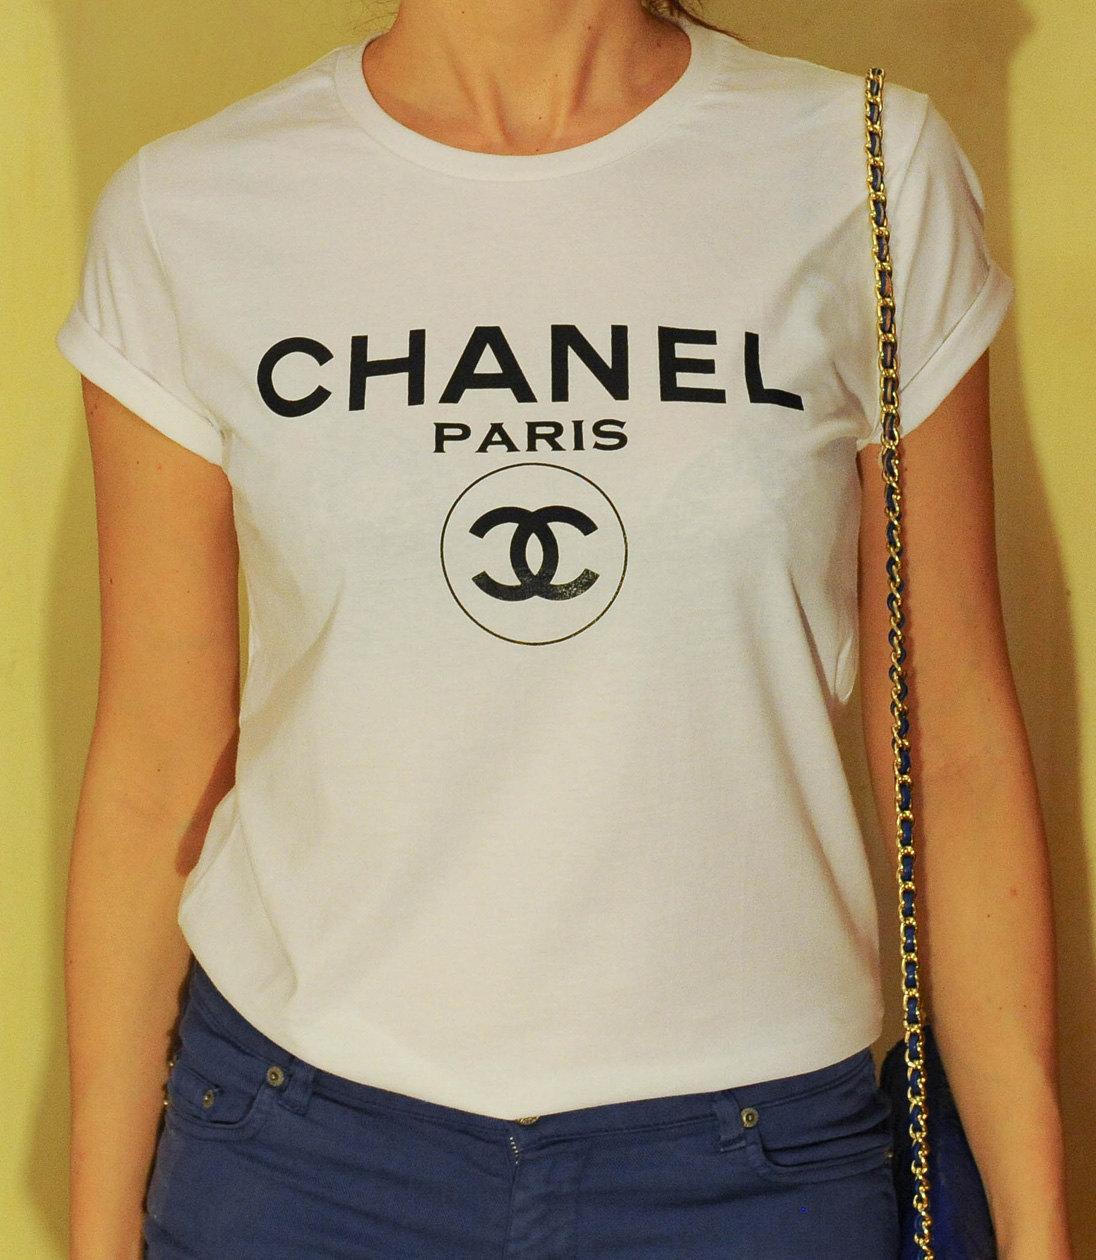 41d16de0fd1 Chanel Paris T-Shirt, Chanel T-Shirt, Woman tee, Woman Tshirt, style  Printed T-shirt